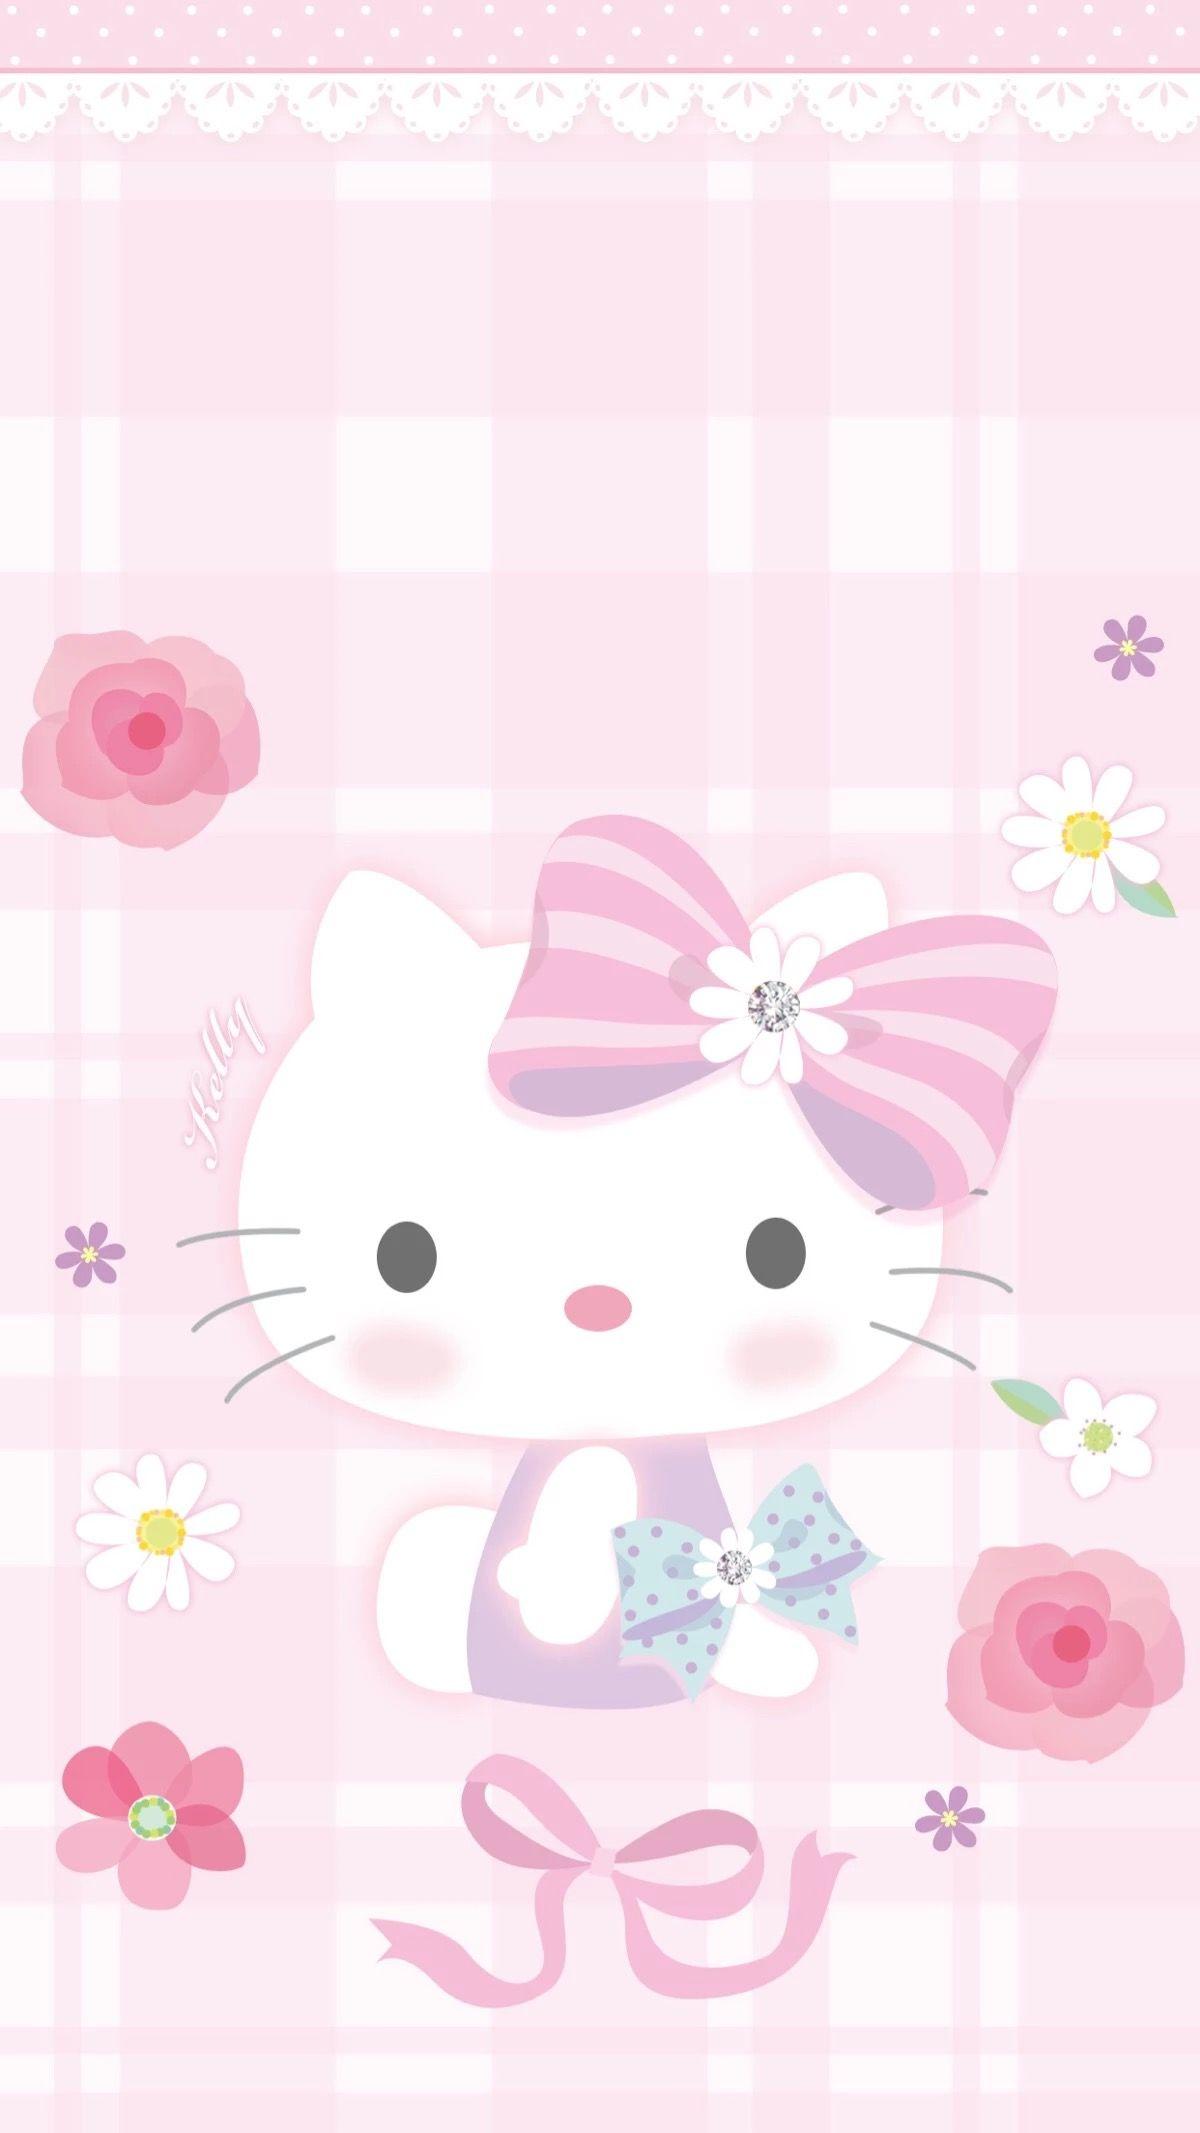 Good Wallpaper Hello Kitty Kawaii - abdb2642ca9dd37e79b65c301c744264  Snapshot_337935.jpg